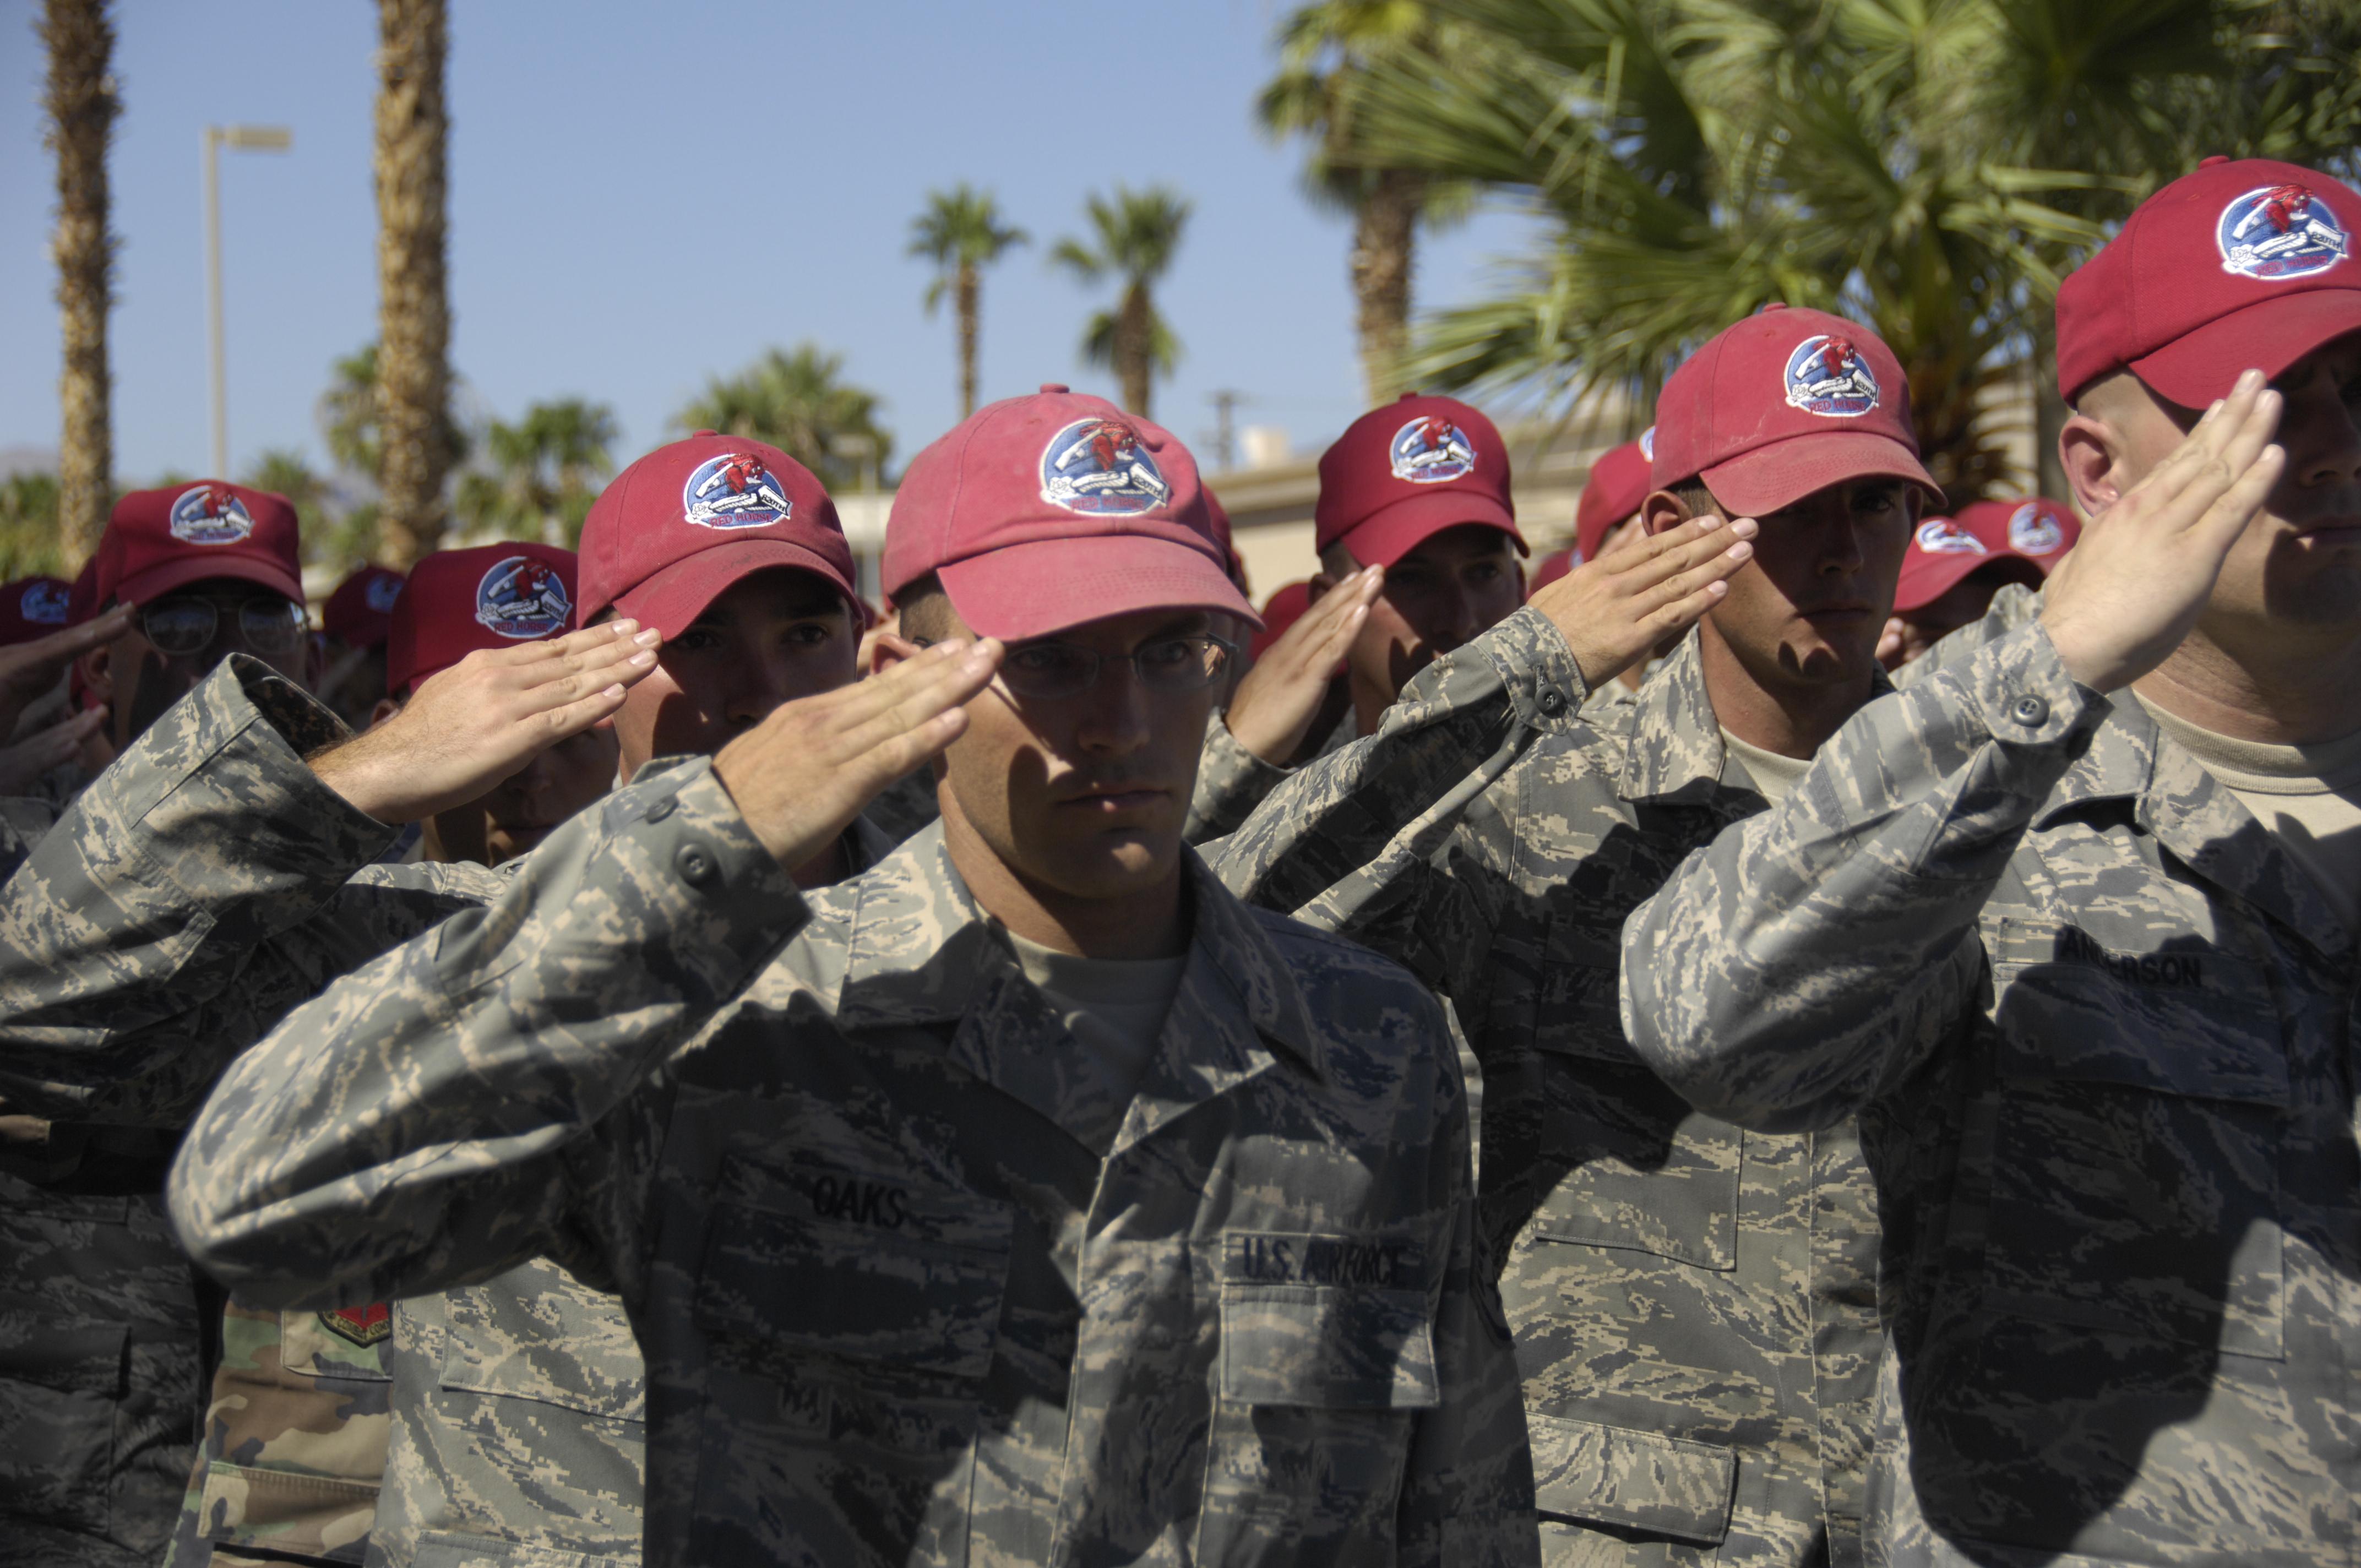 820th Red Horse Squadron Nellis Remember Fallen Airman